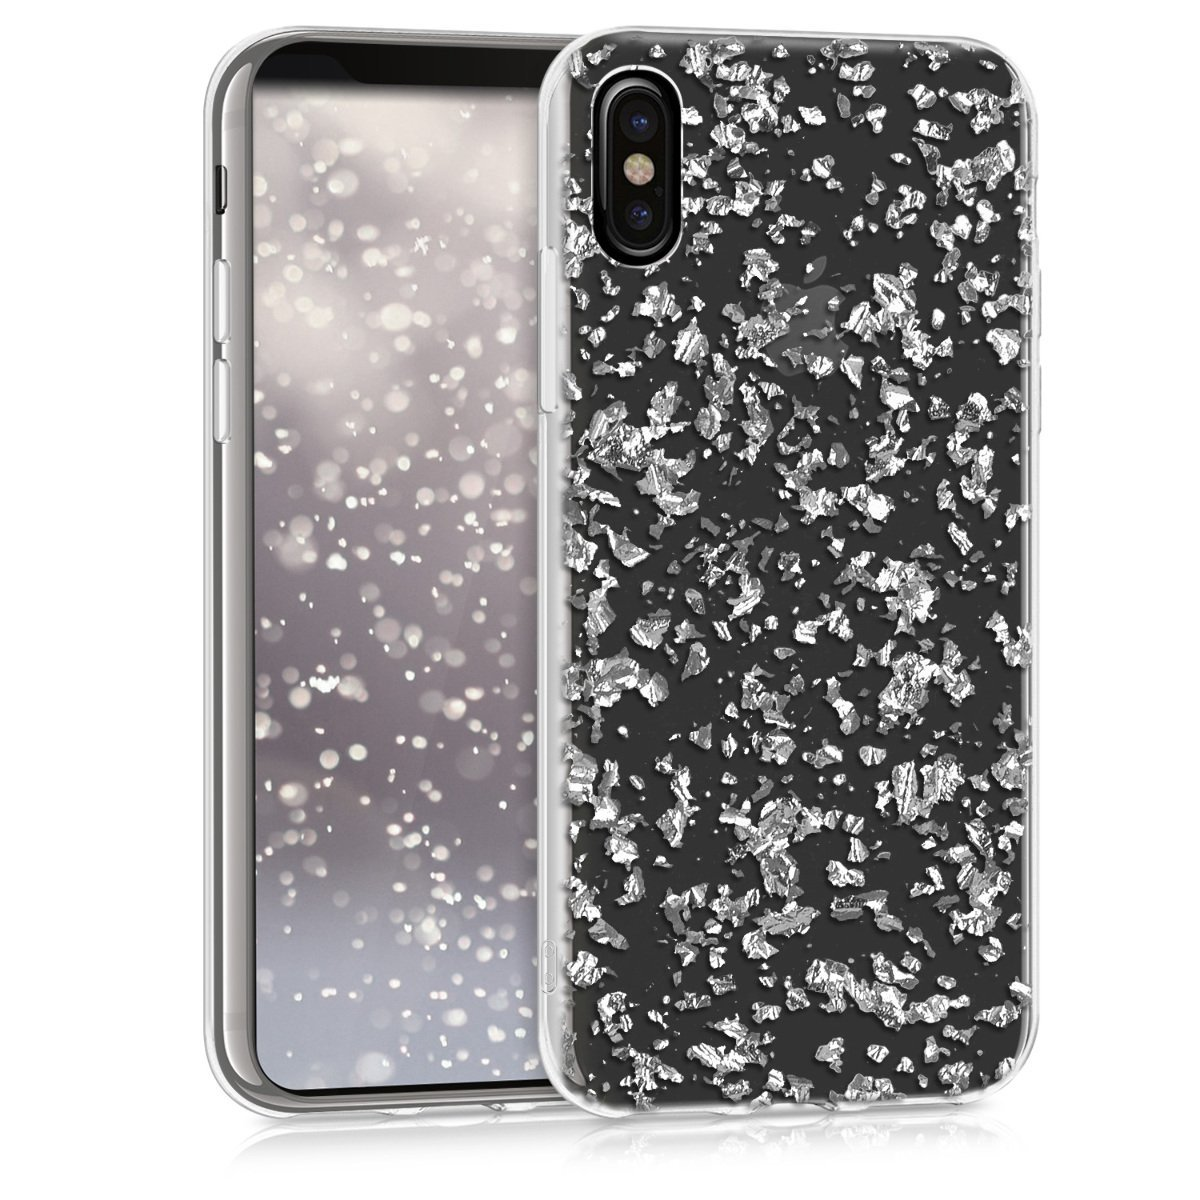 KW Θήκη Σιλικόνης iPhone X / XS - Silver Flakes (42494.35)